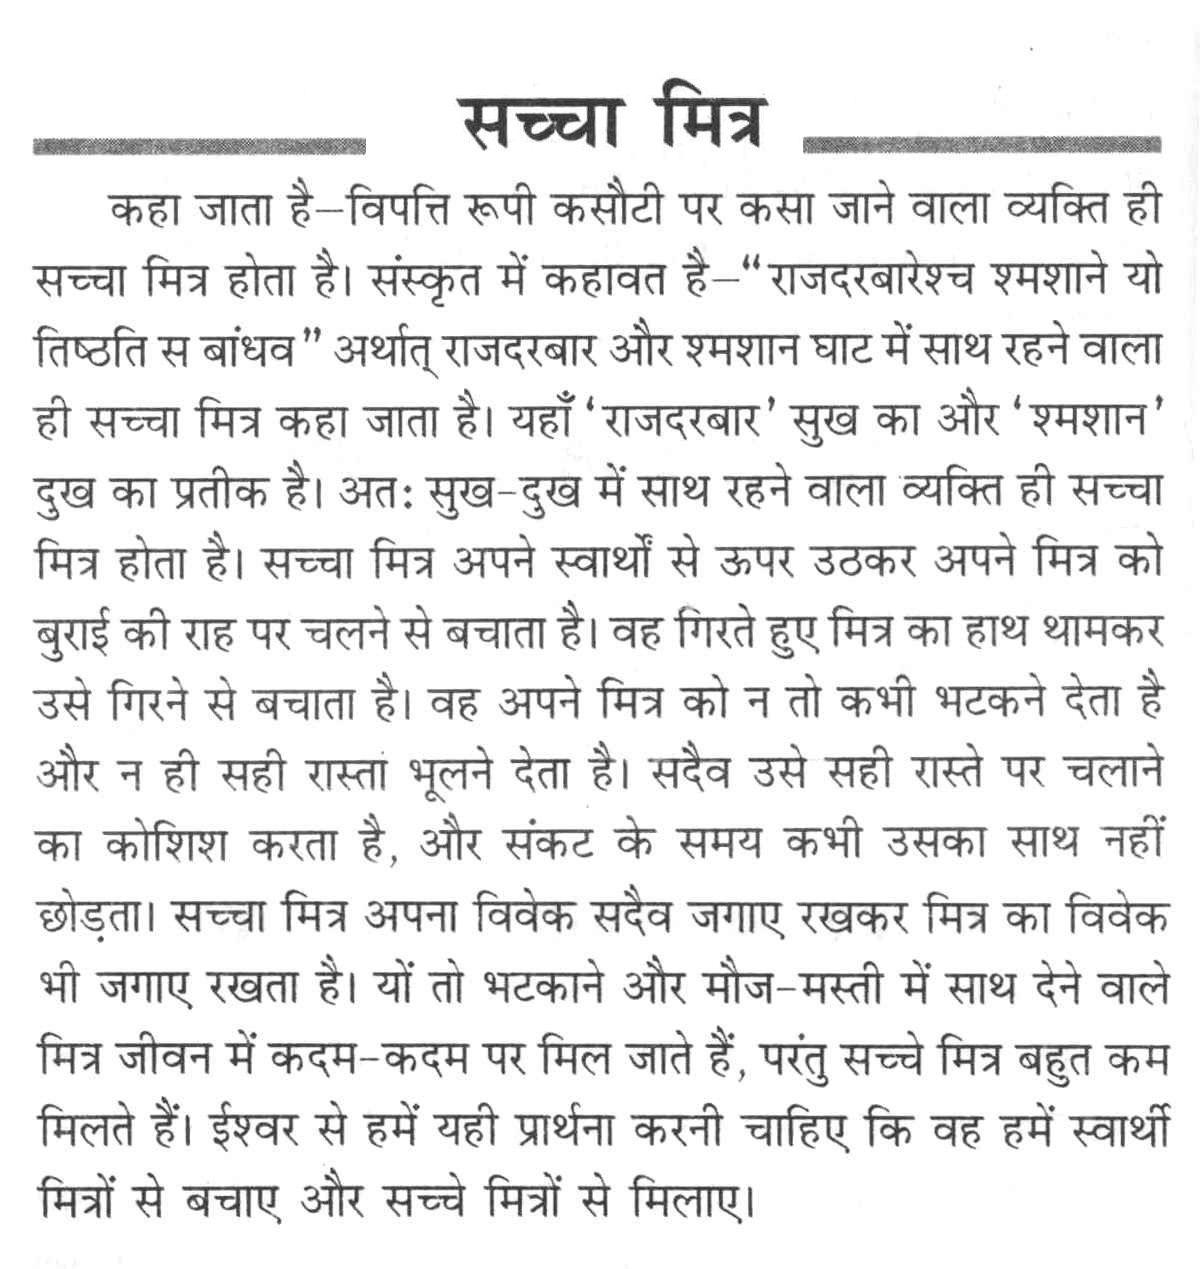 Friendship Day Essay In Hindi Language Summer writing